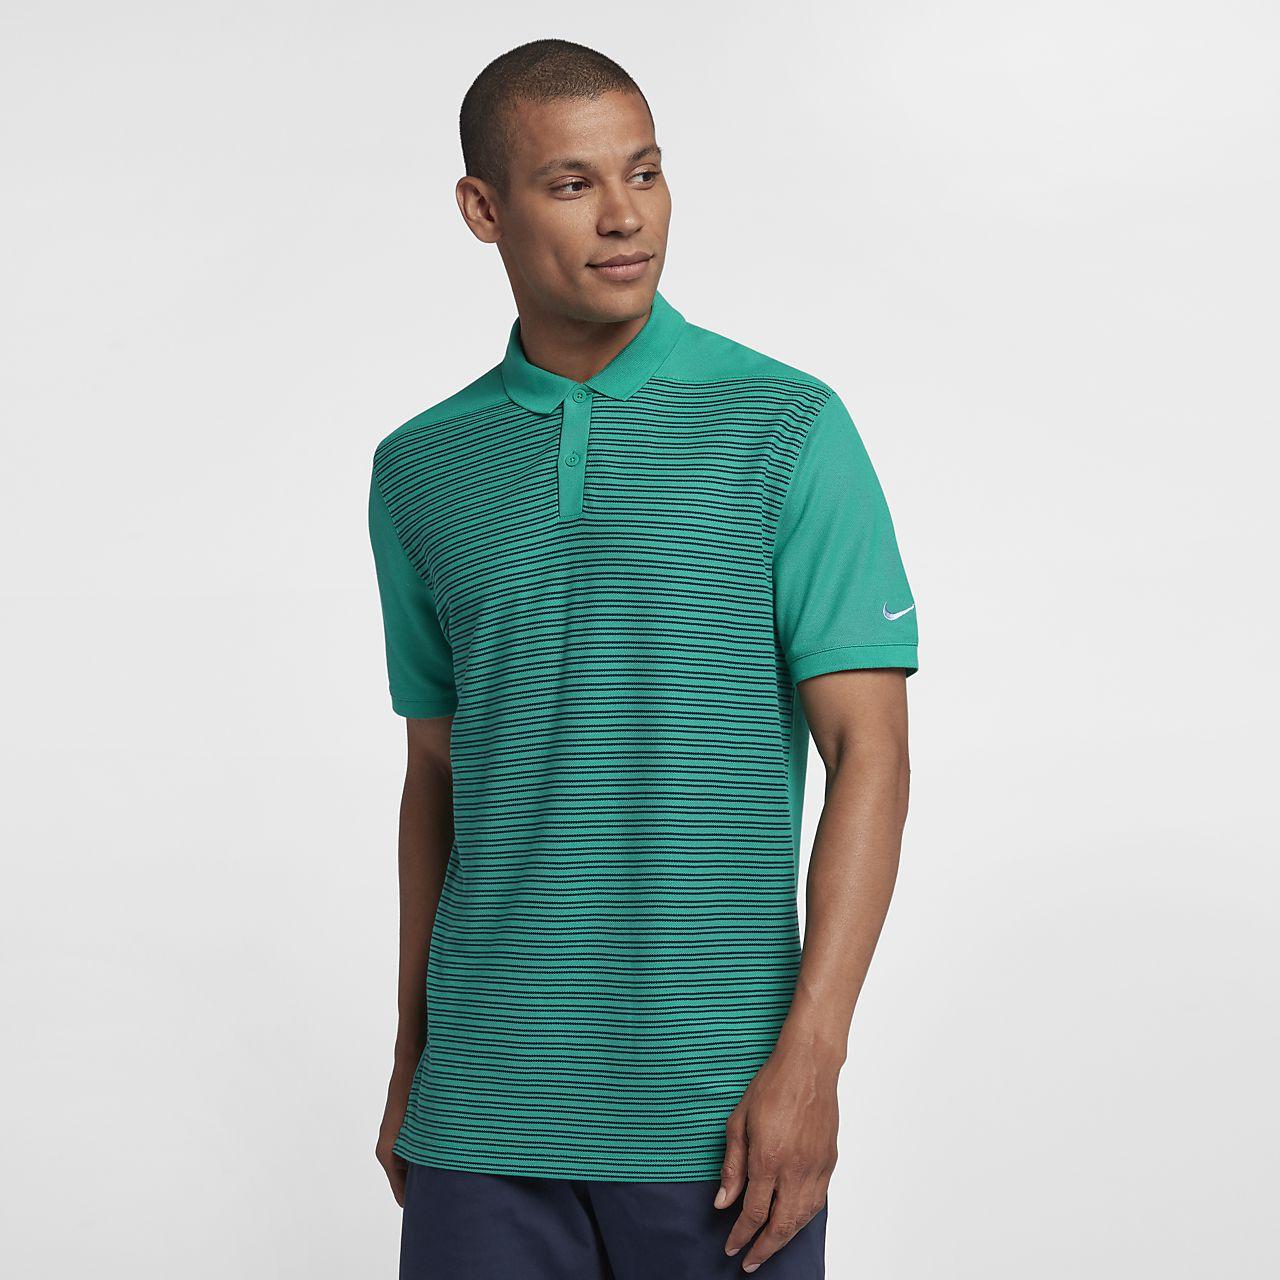 c3e9677b8 Nike Dri-FIT Men's Golf Polo. Nike.com SI